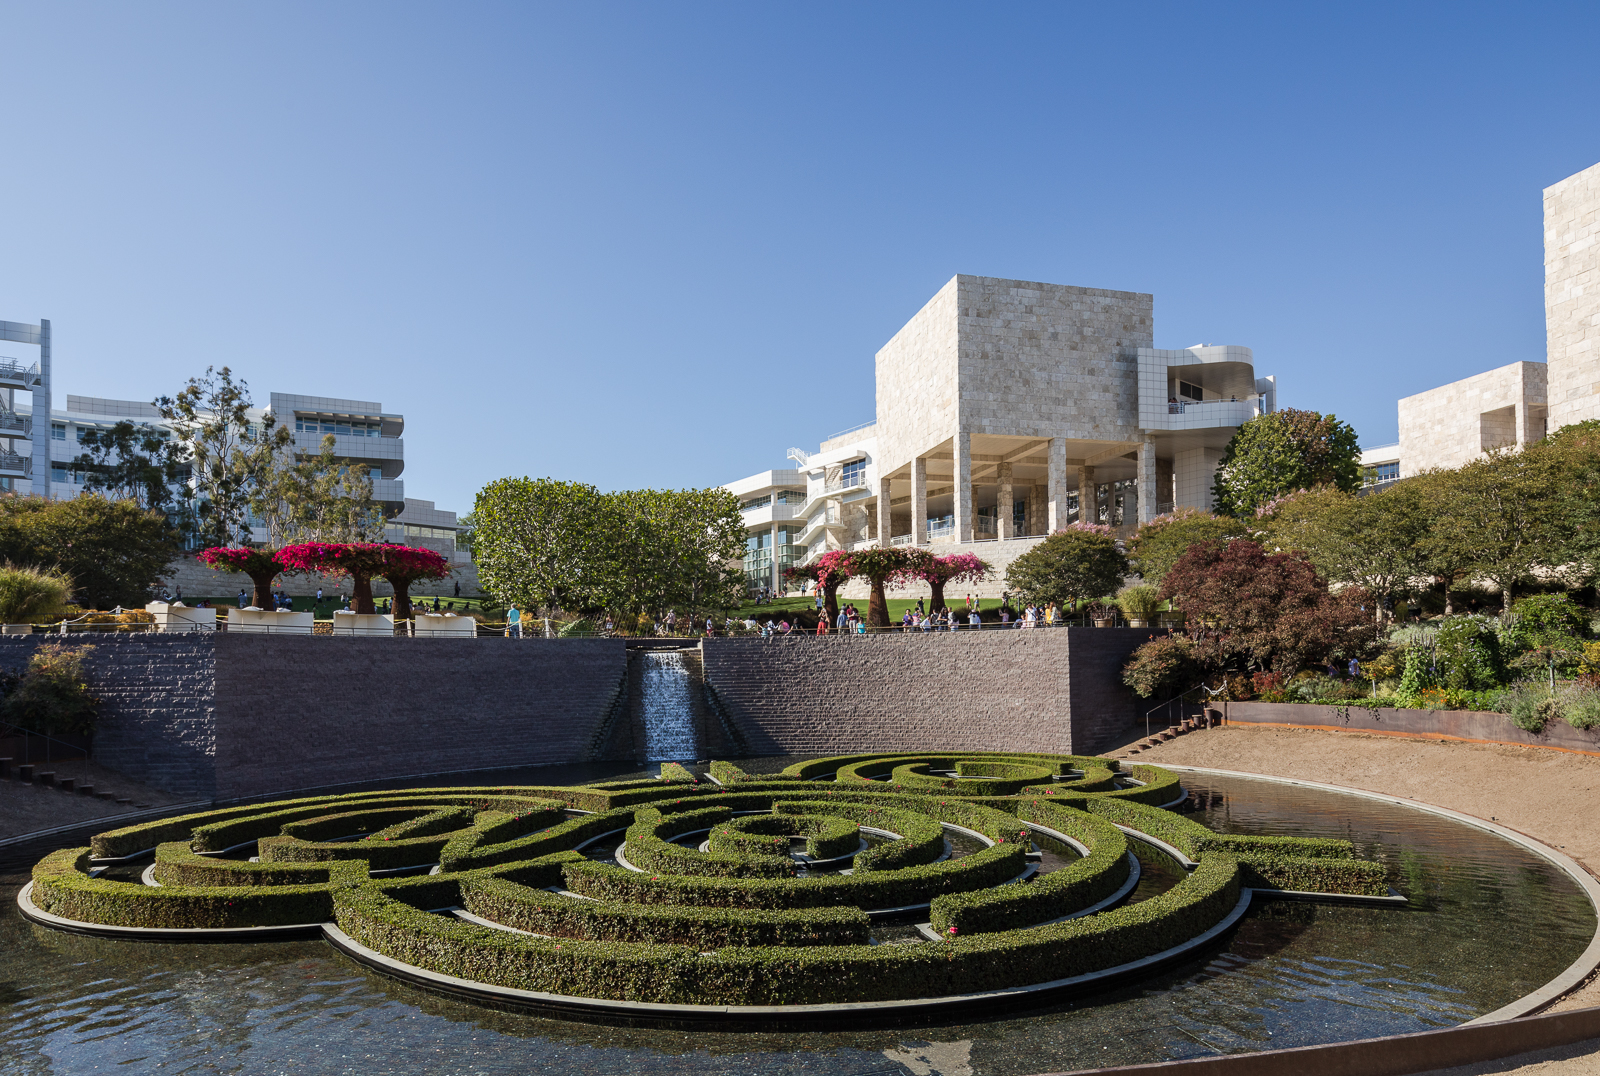 The center garden created by artist Robert Irwin